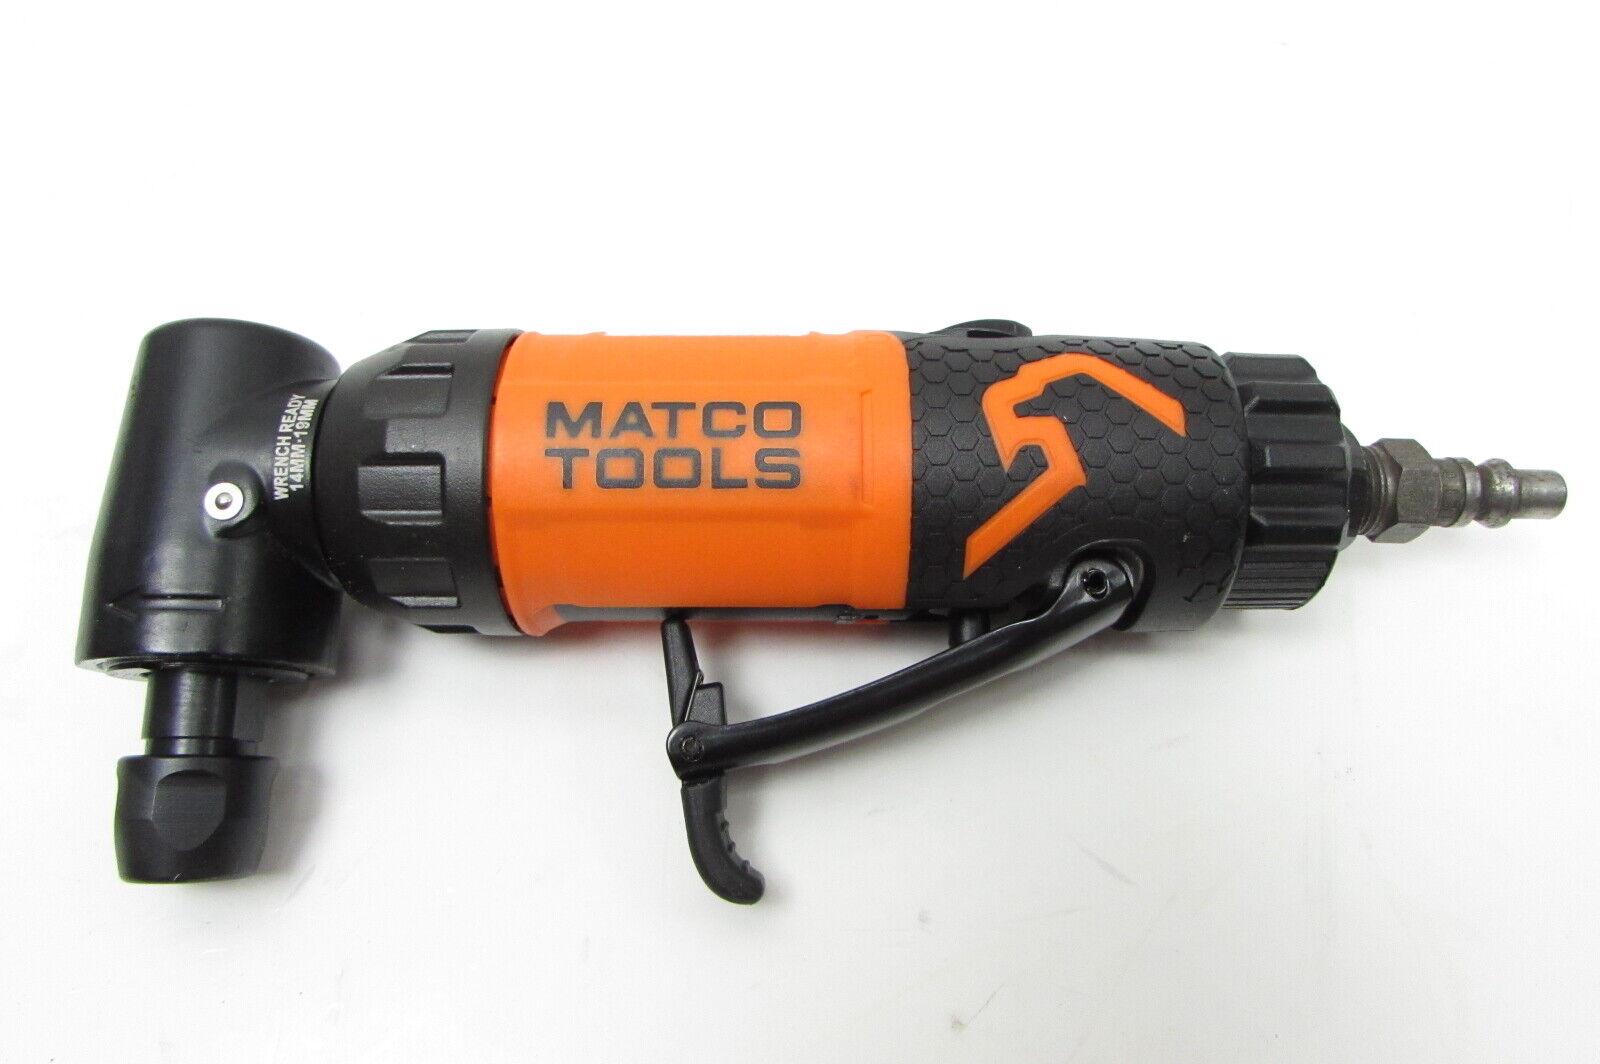 Matco MT5883 .85HP Angle Die Grinder - Orange. Buy it now for 179.97